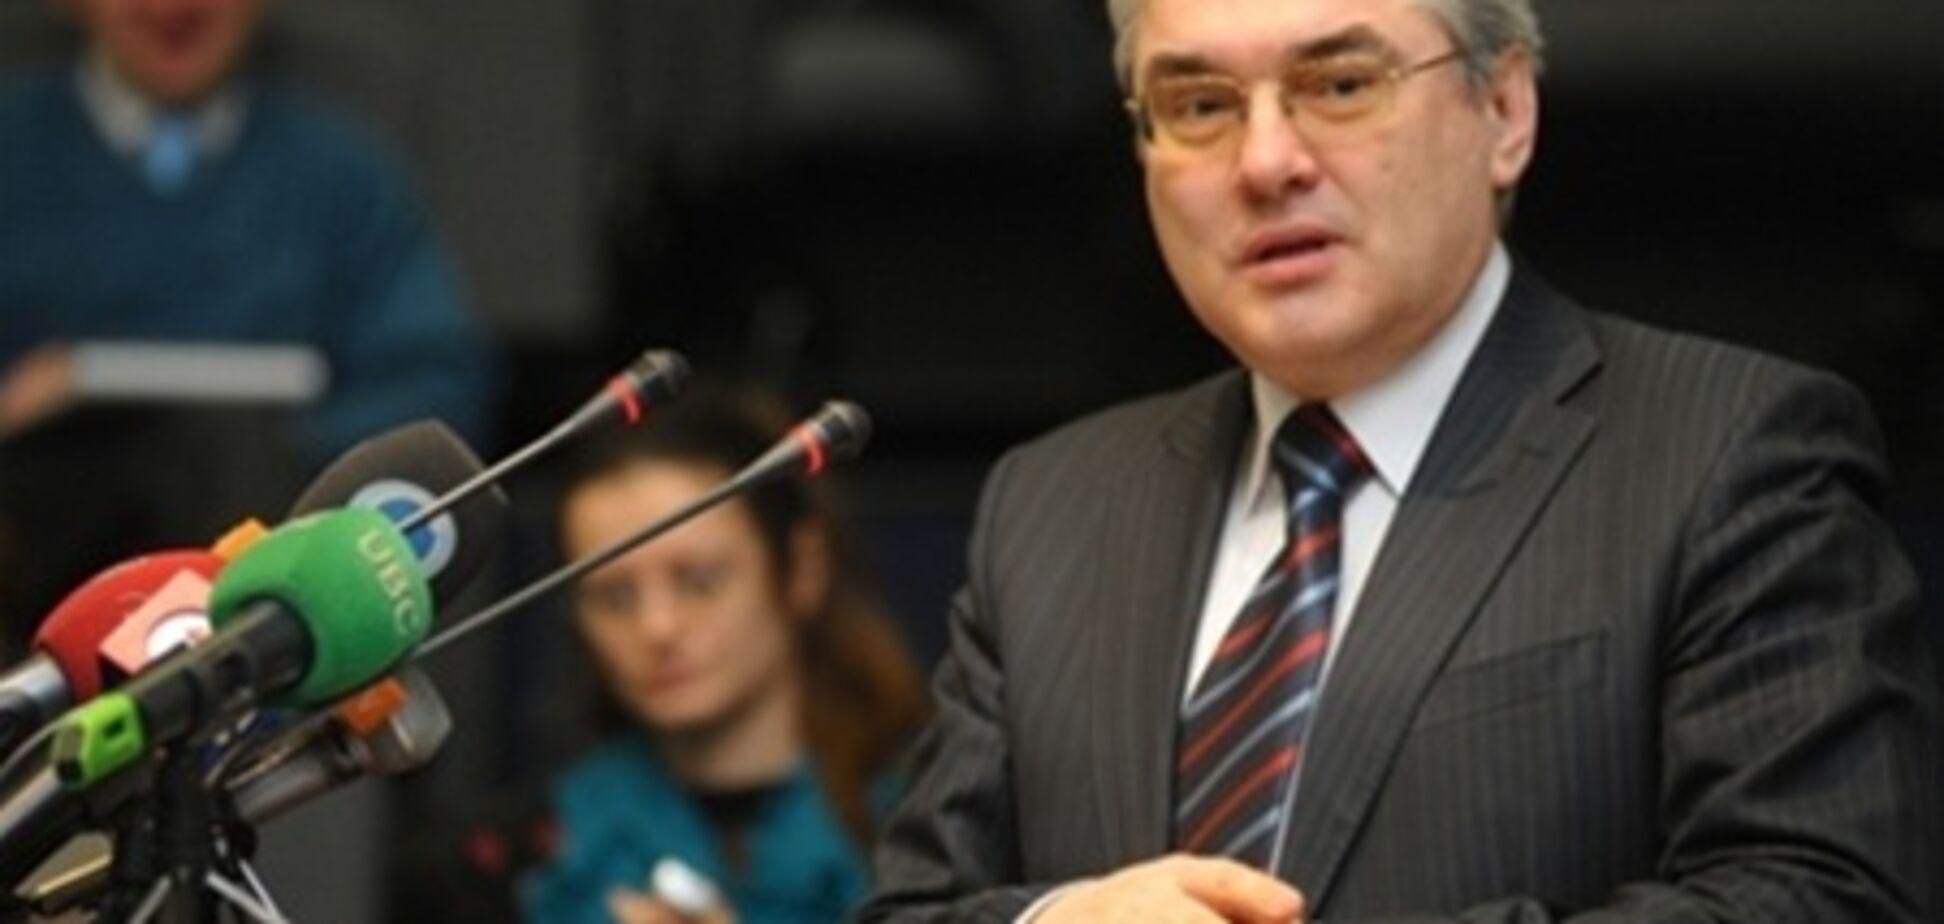 Експерт: угода про ЗВТ не означає членство України в ЄС